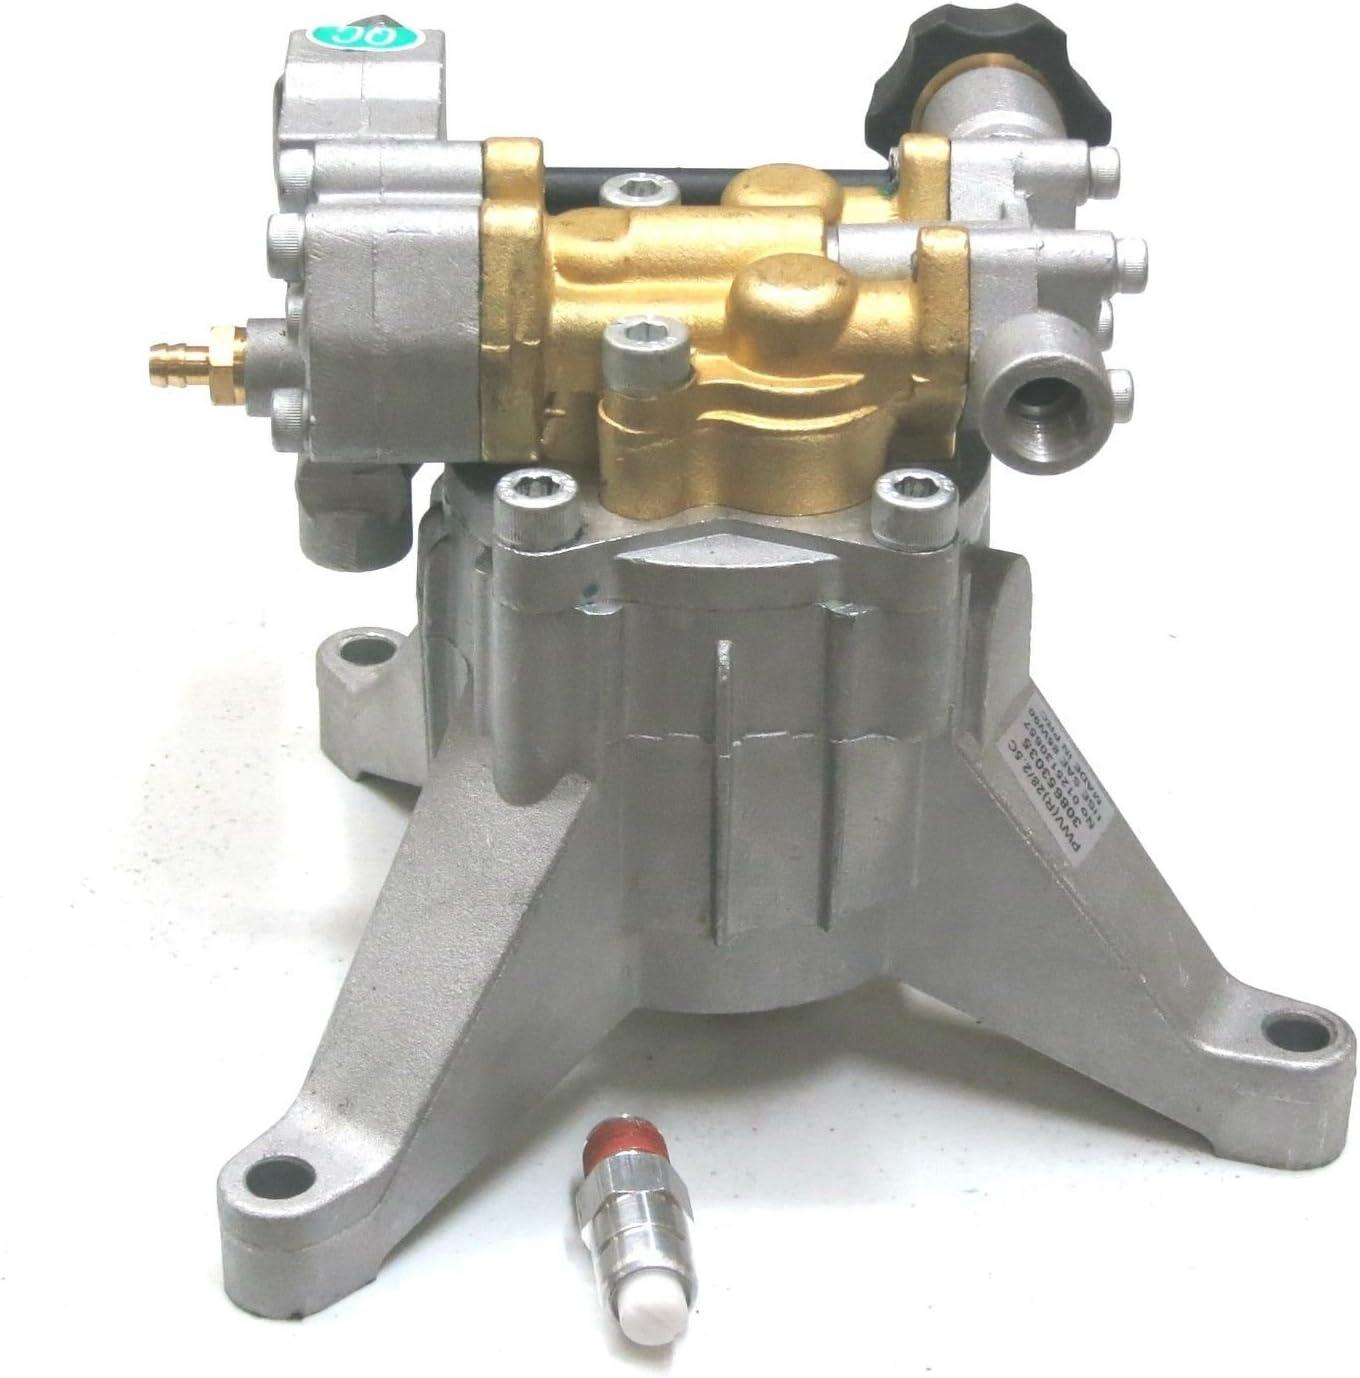 3100 PSI POWER PRESSURE WASHER PUMP Upgraded Delta DT2200P DT2400CS